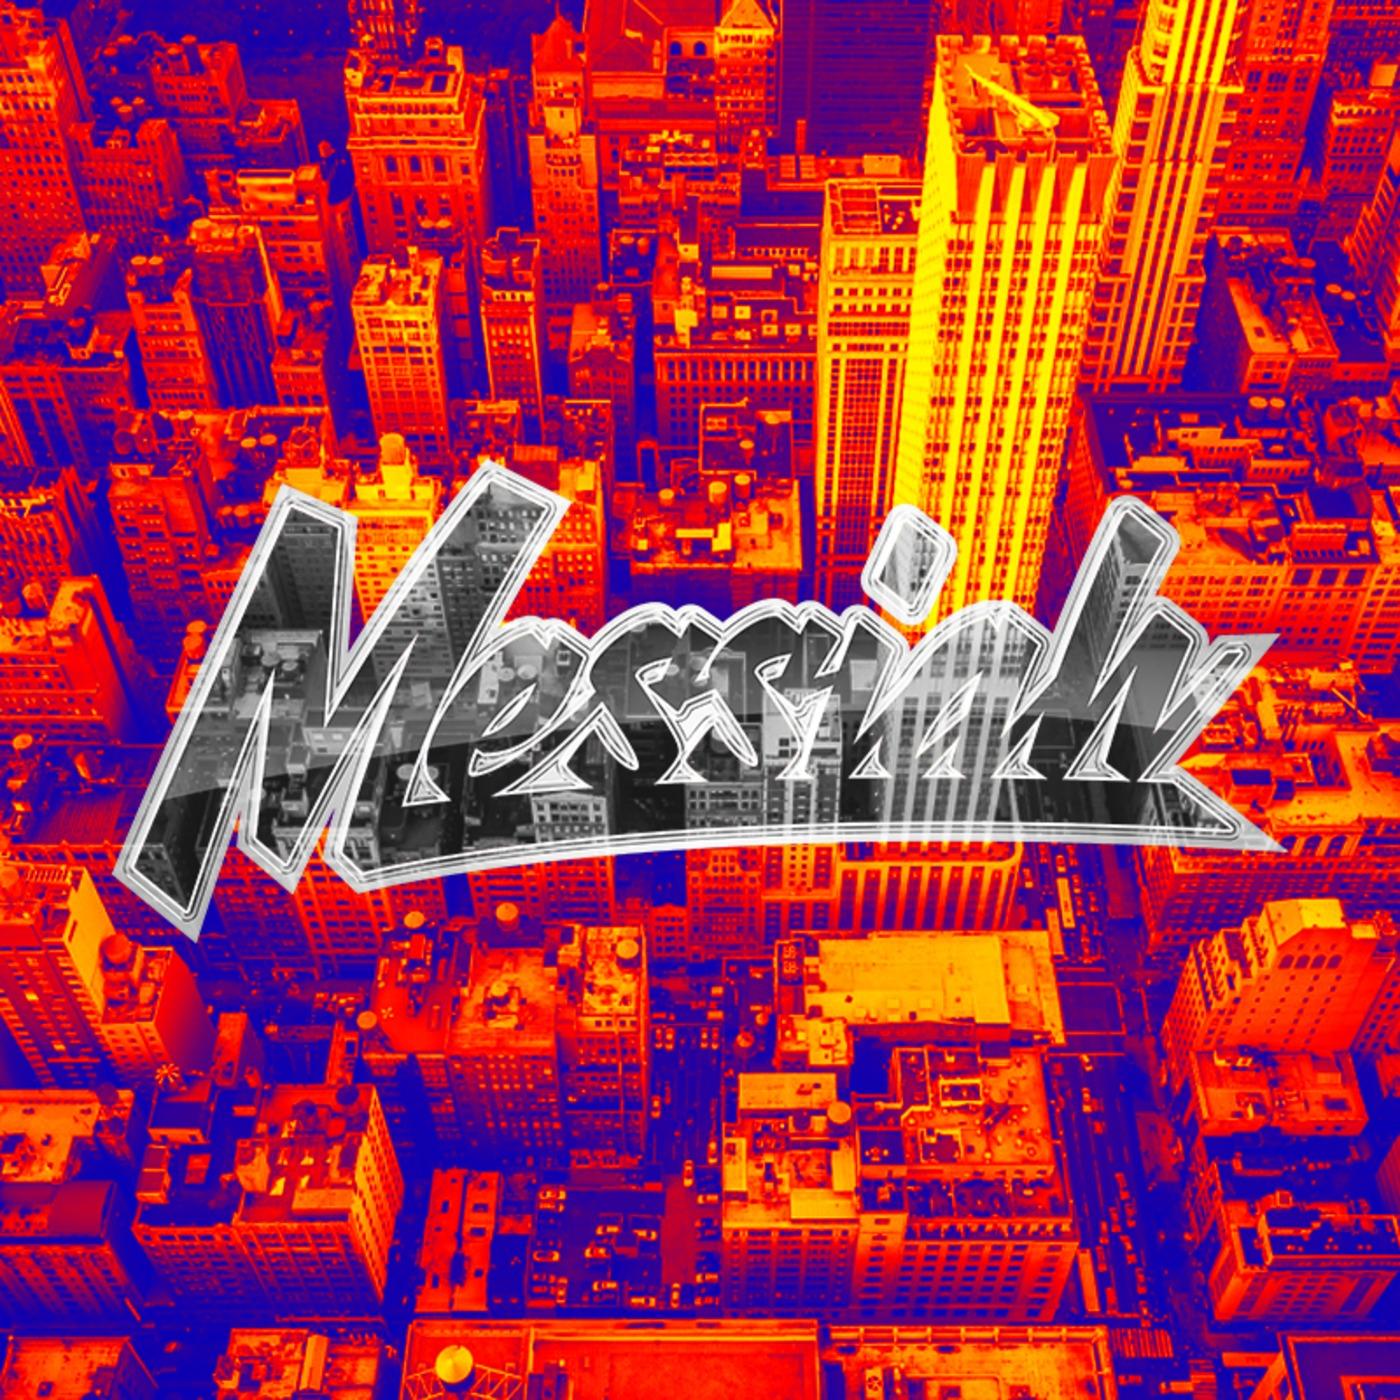 Dj Messiah Podcast - DJ Messiah Podcast Episode 3 - Live